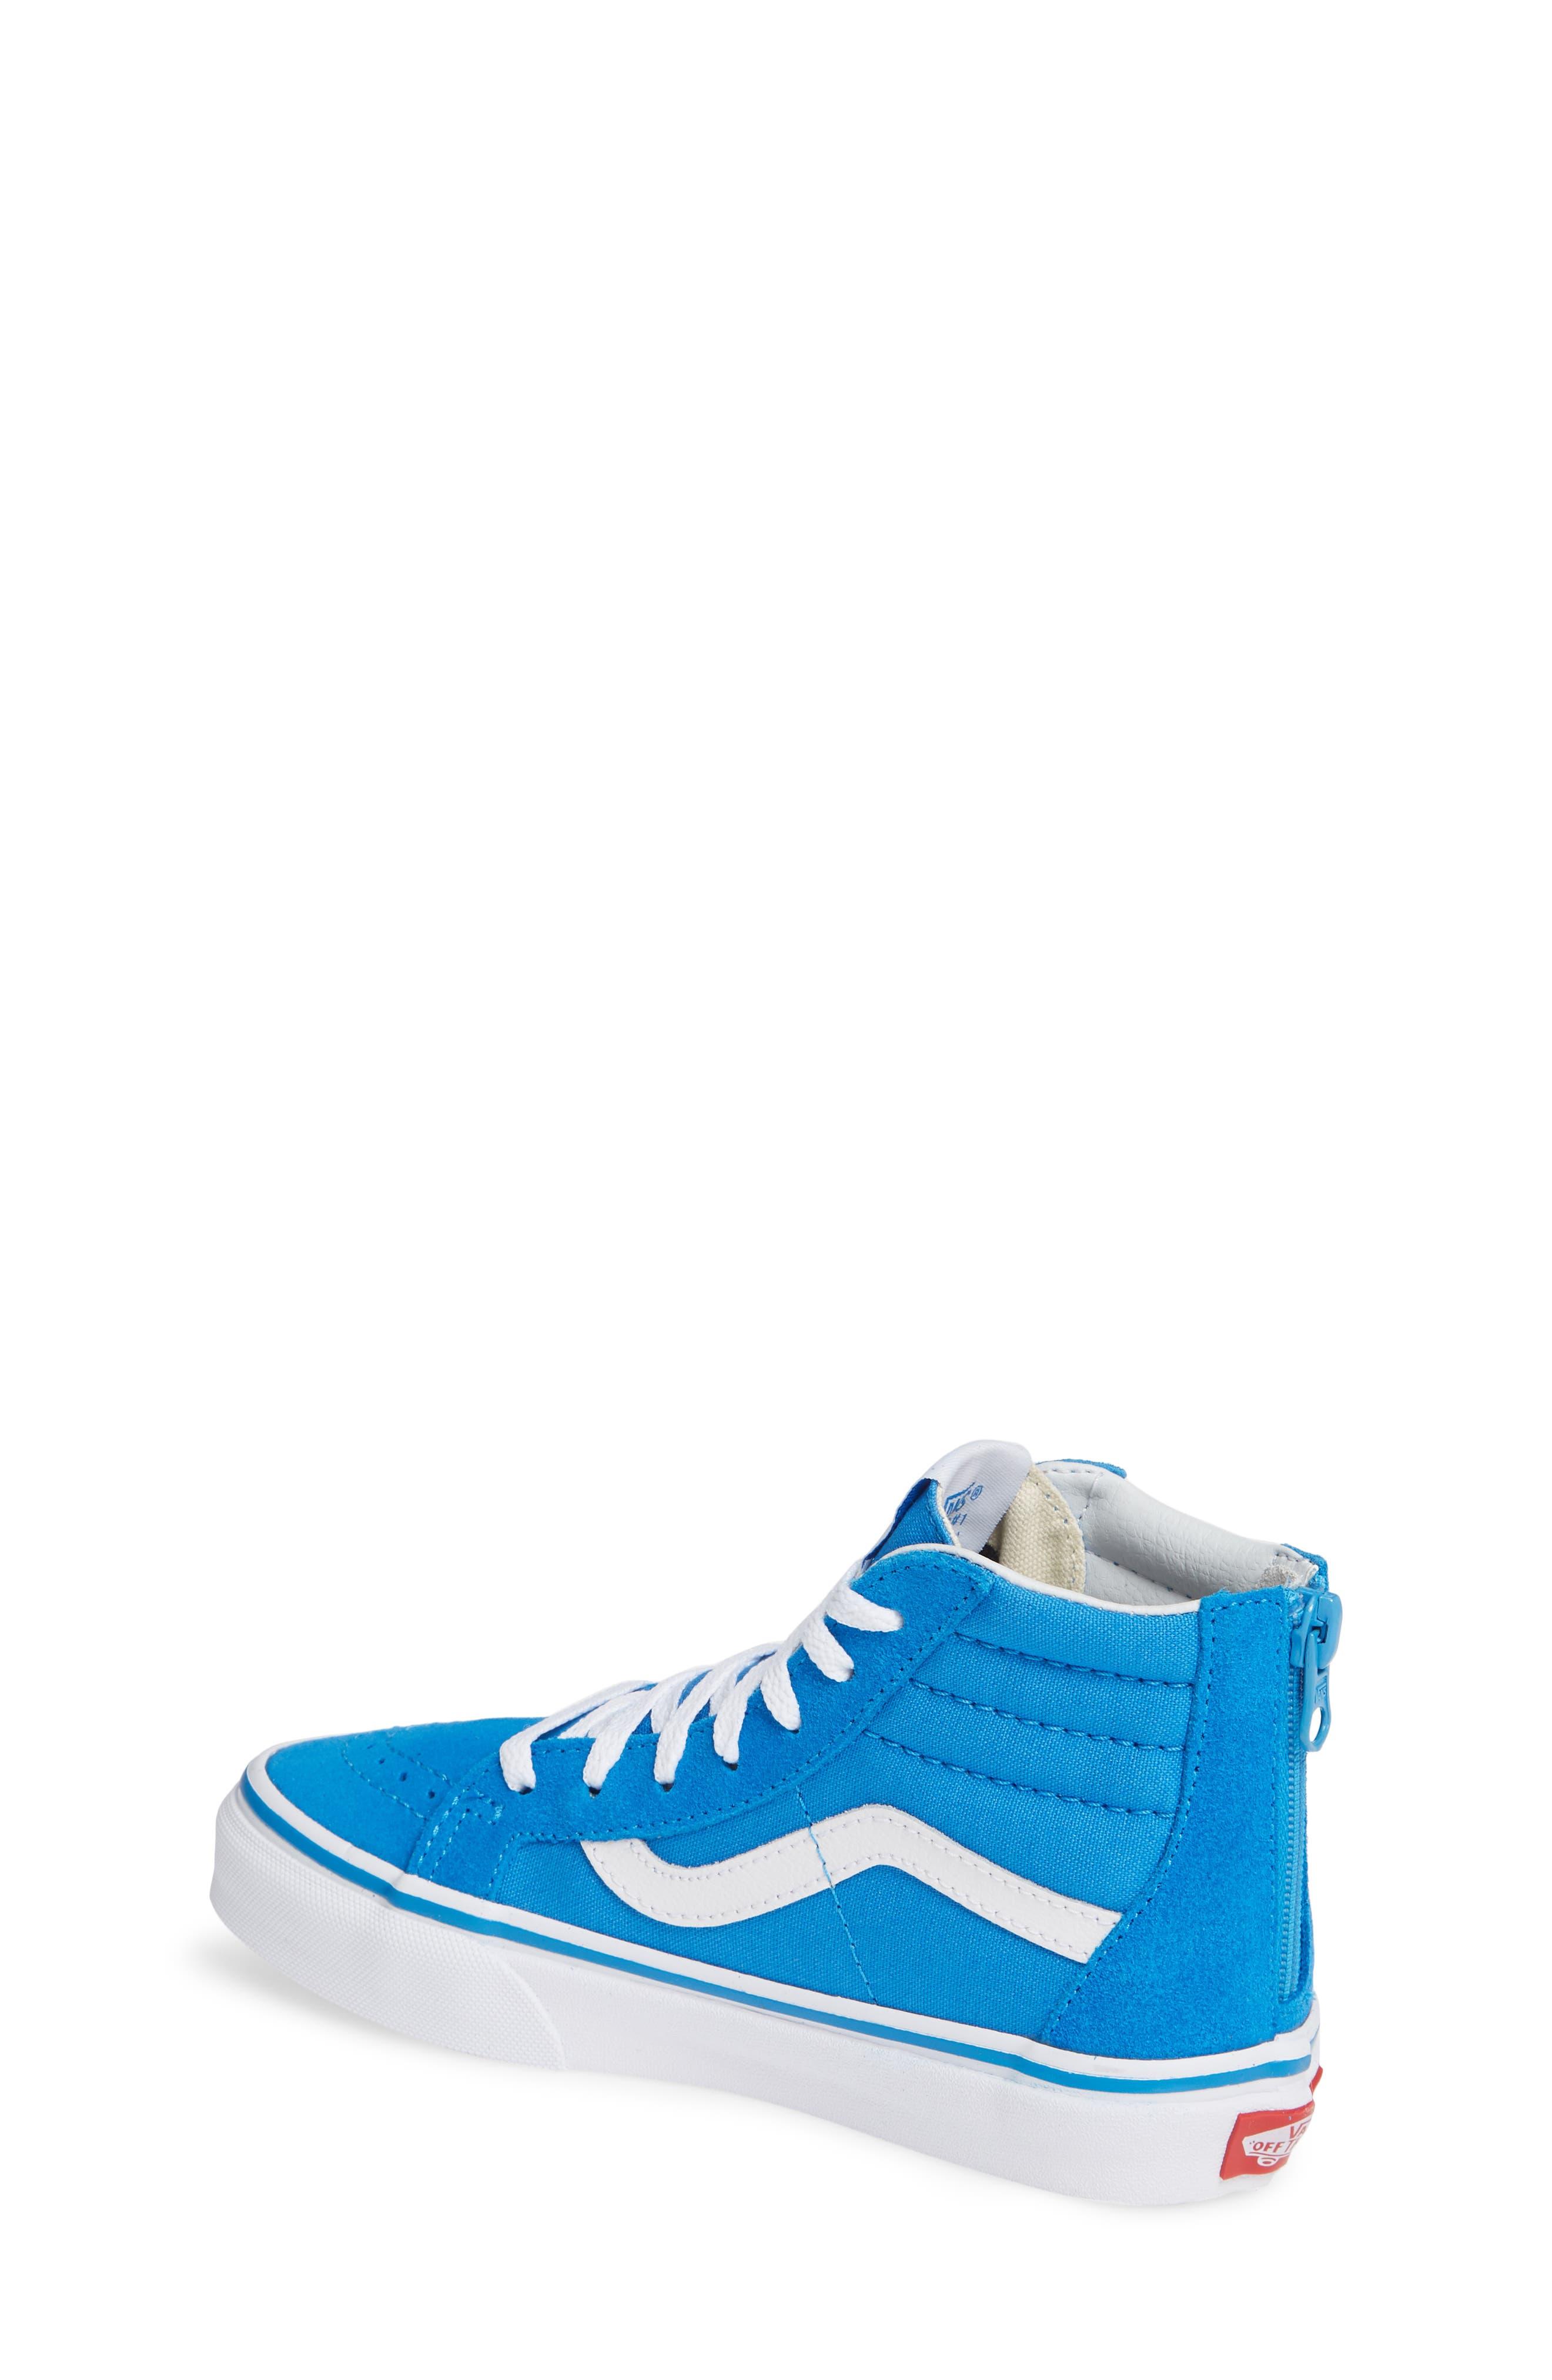 VANS, 'Sk8-Hi' Sneaker, Alternate thumbnail 2, color, INDIGO BUNTING/ TRUE WHITE